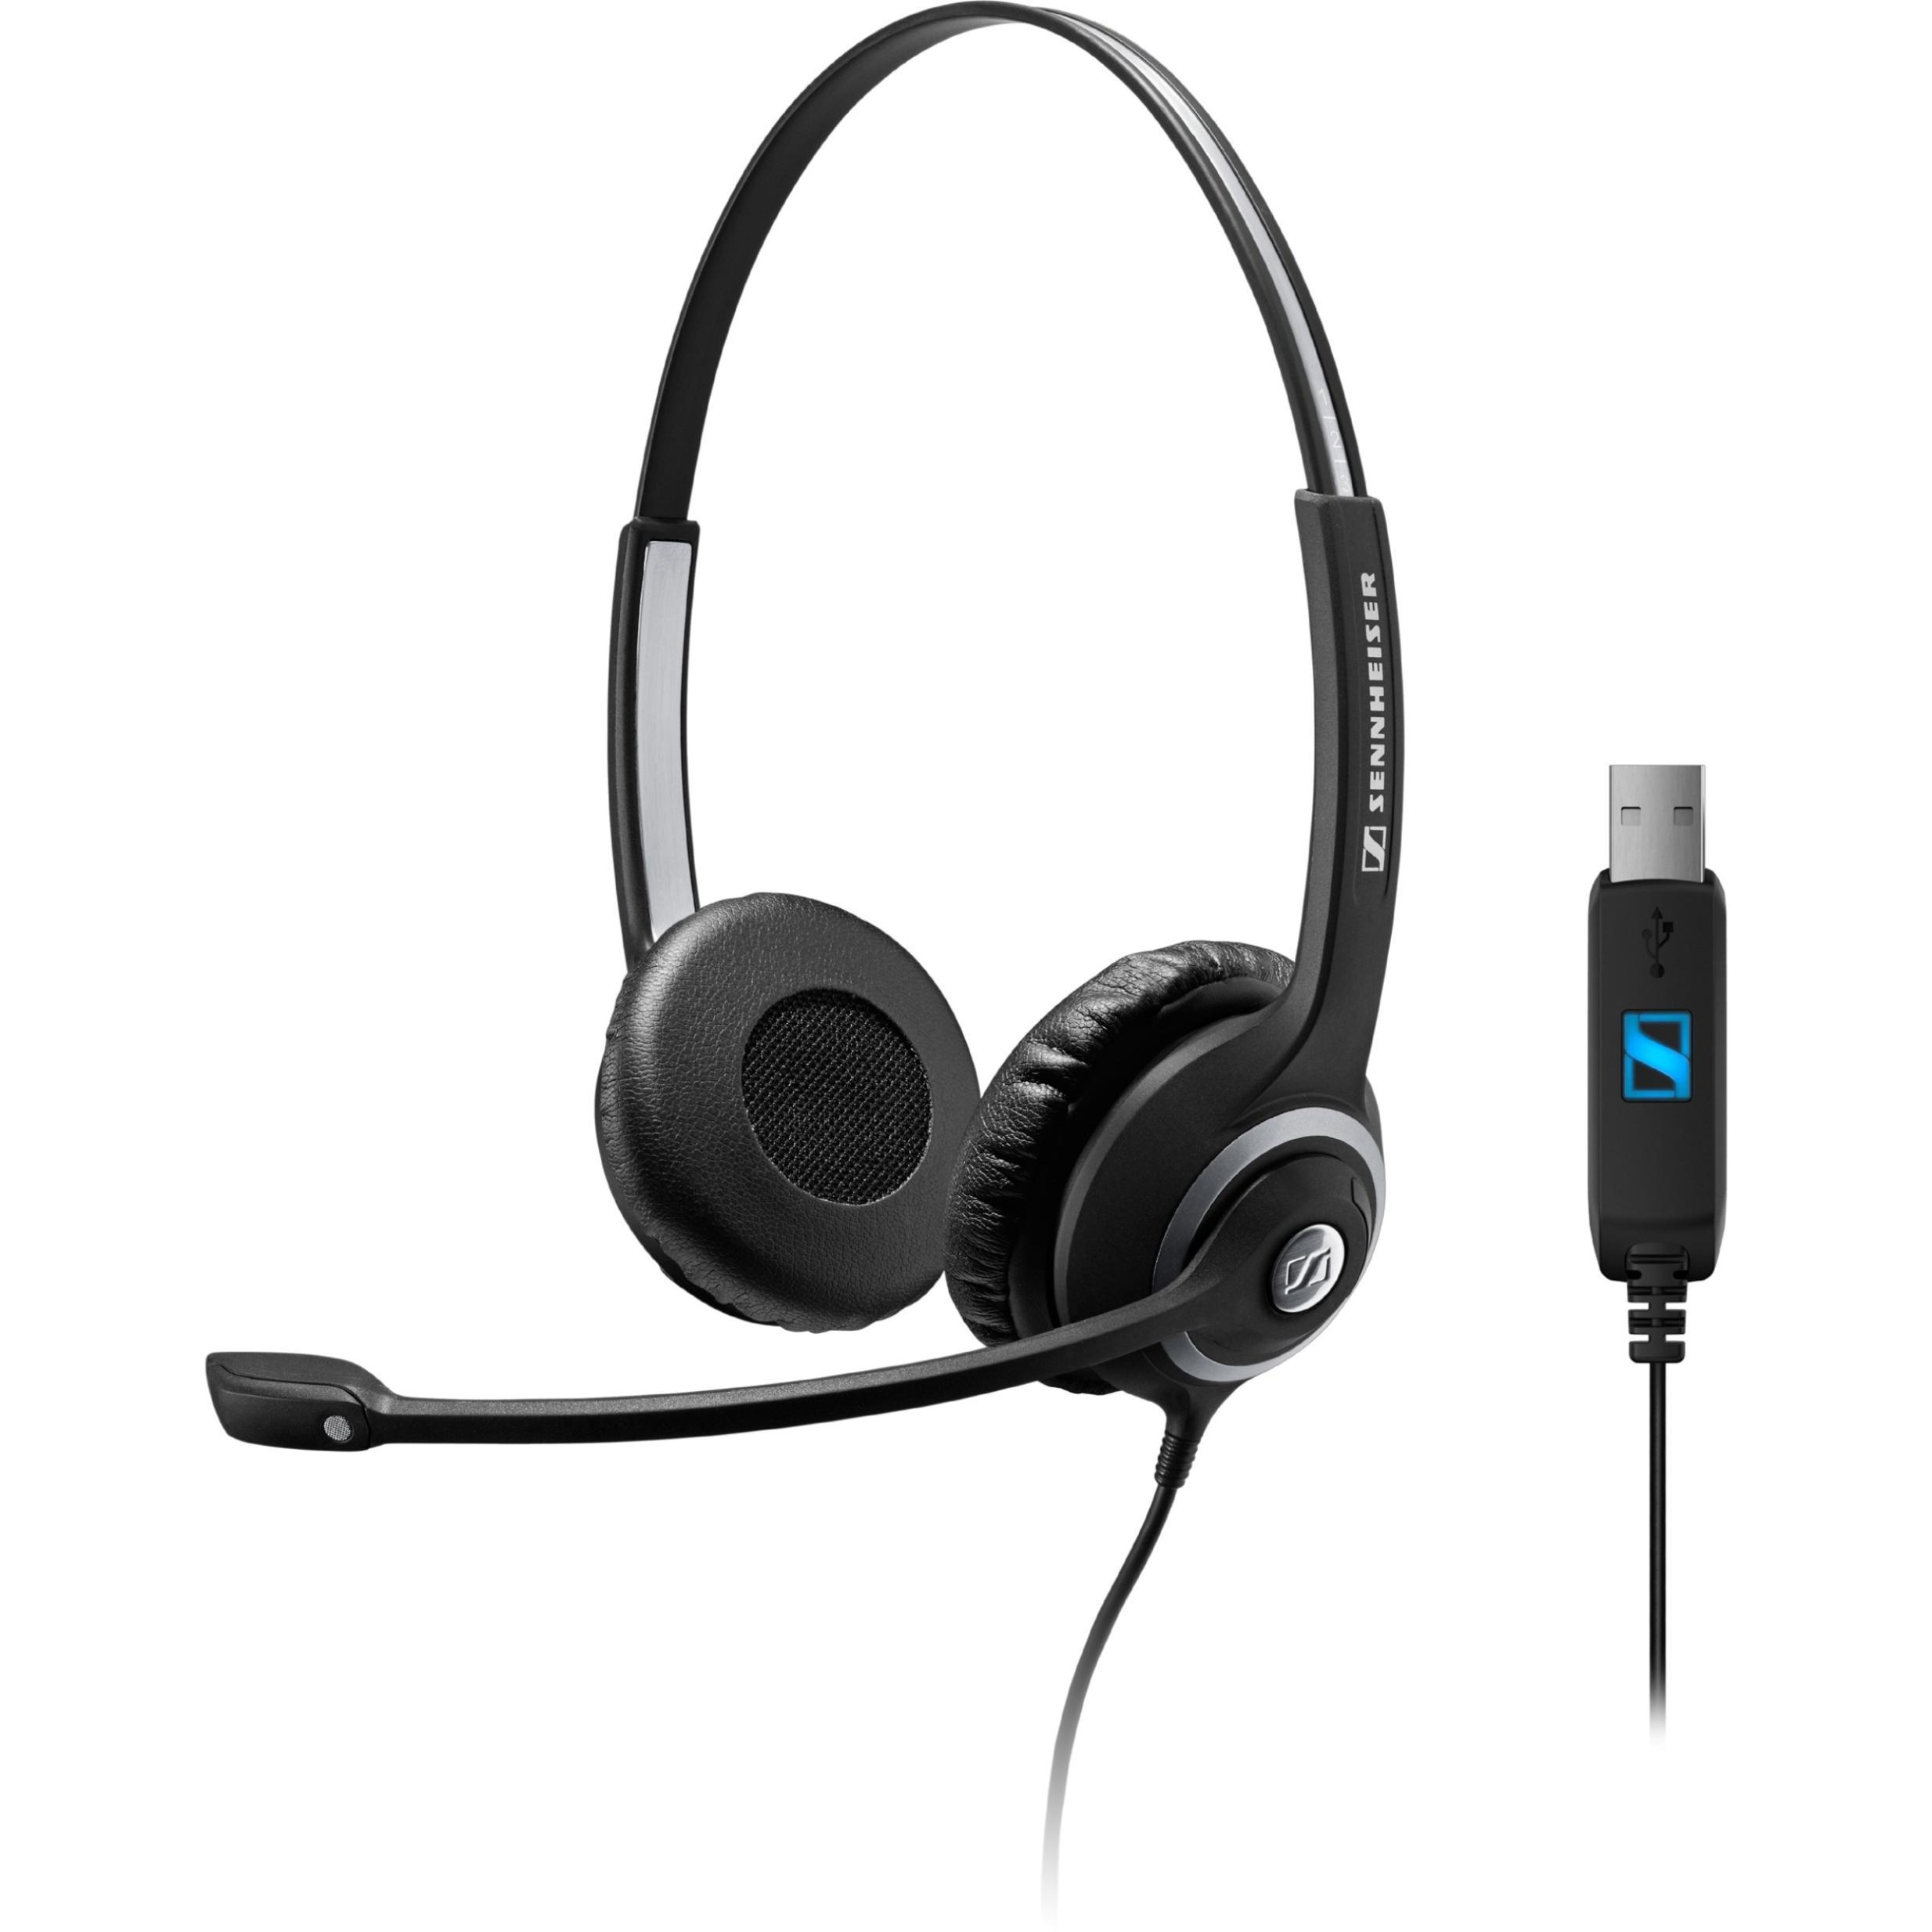 EPOS Sennheiser SC 260 USB Headset